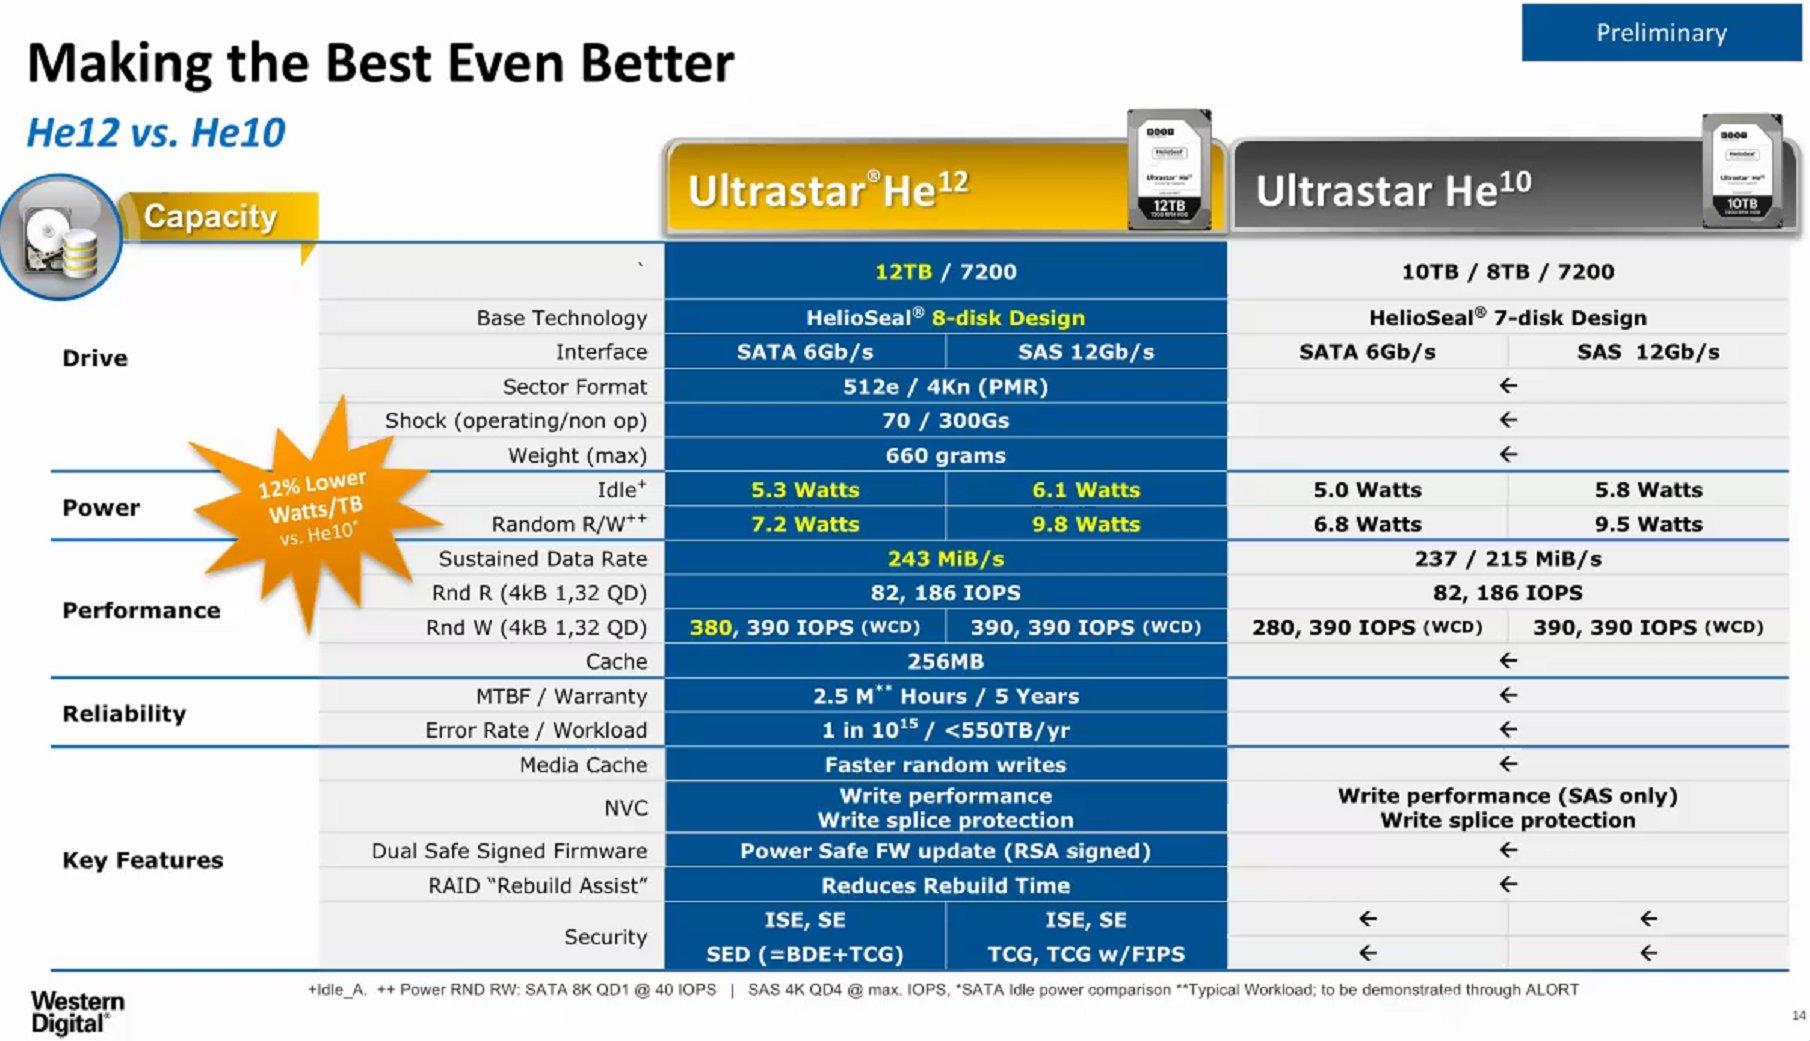 Ultrastar He12 mit 12 TByte auf 8 Plattern